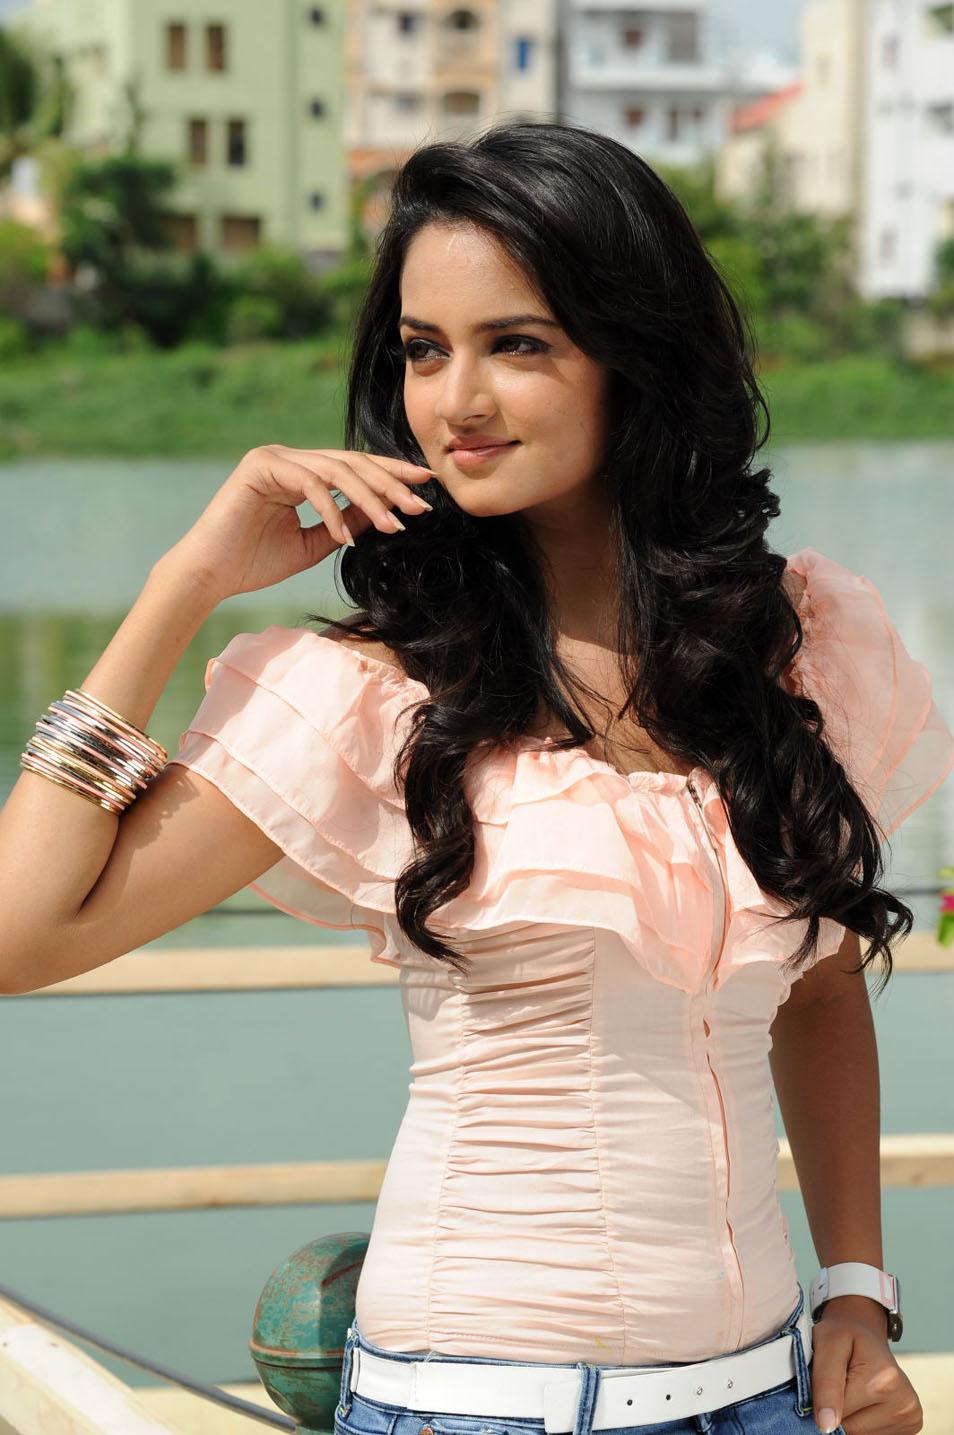 Shanvi from Adda Movie Photo Gallery Shanvi10